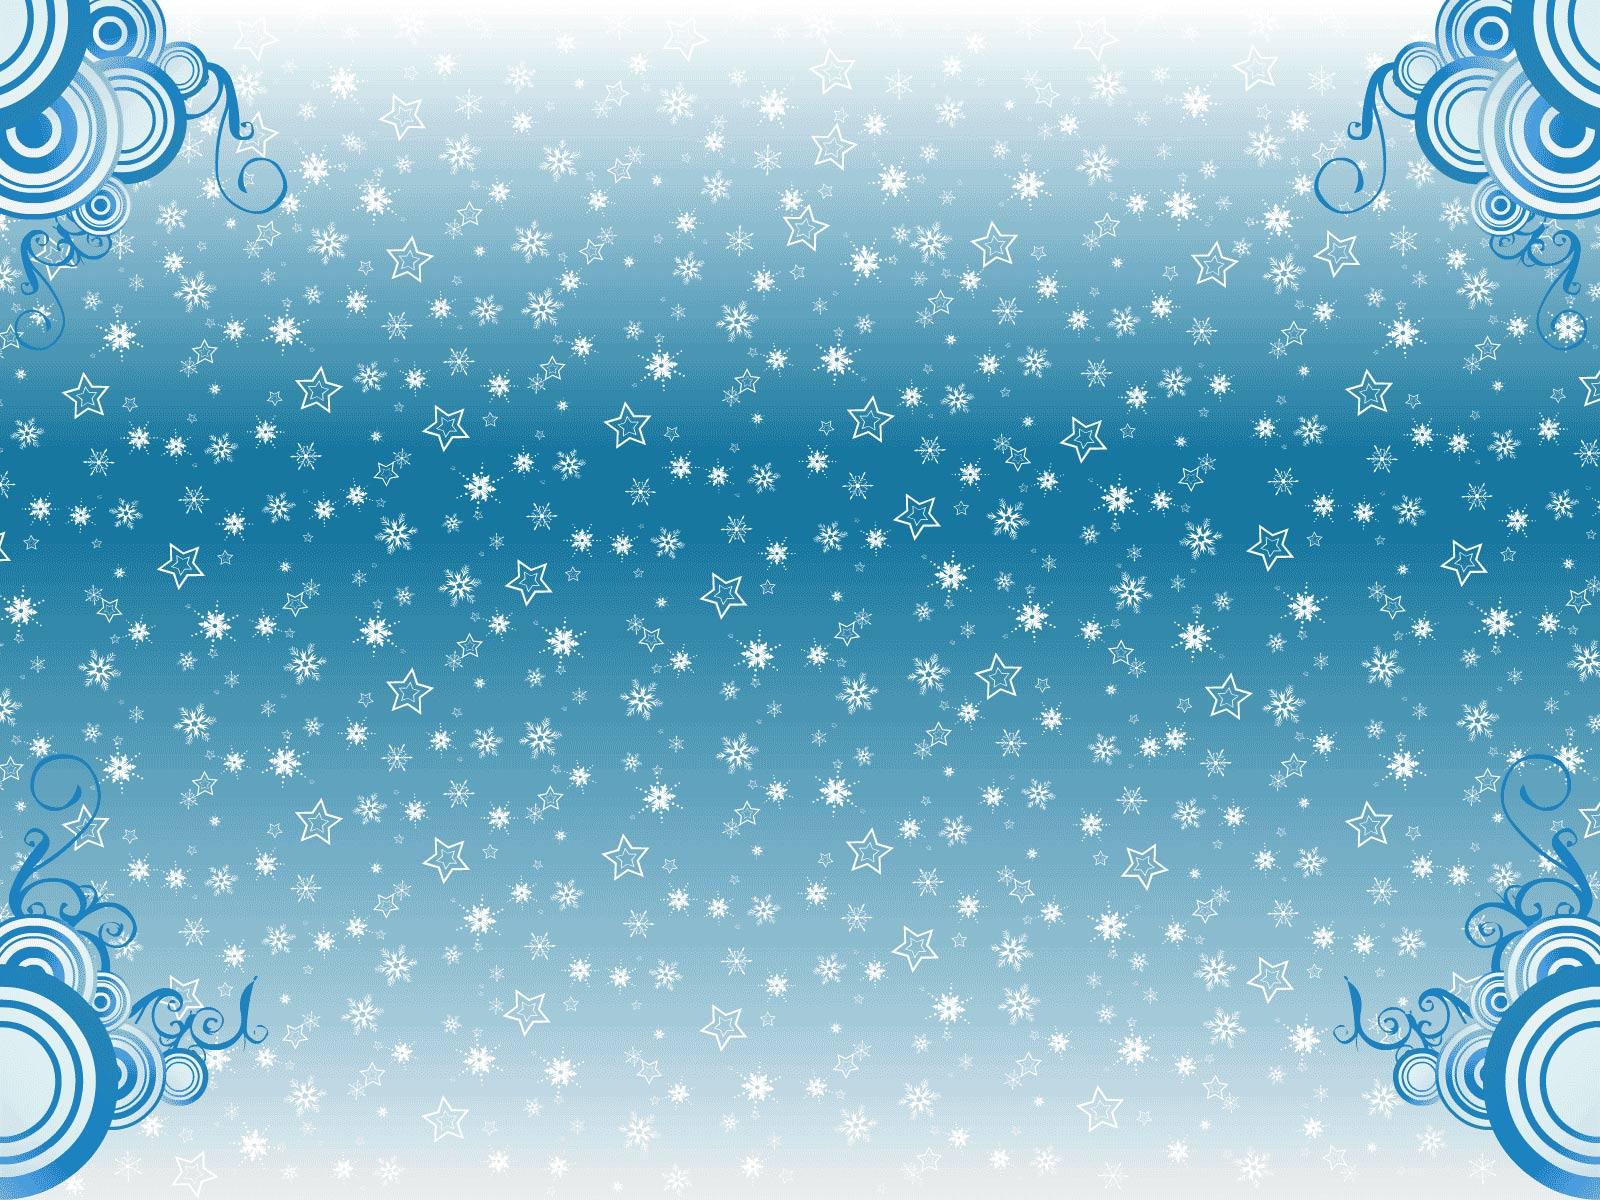 Background winter Desktop Wallpaper High Quality 1600x1200